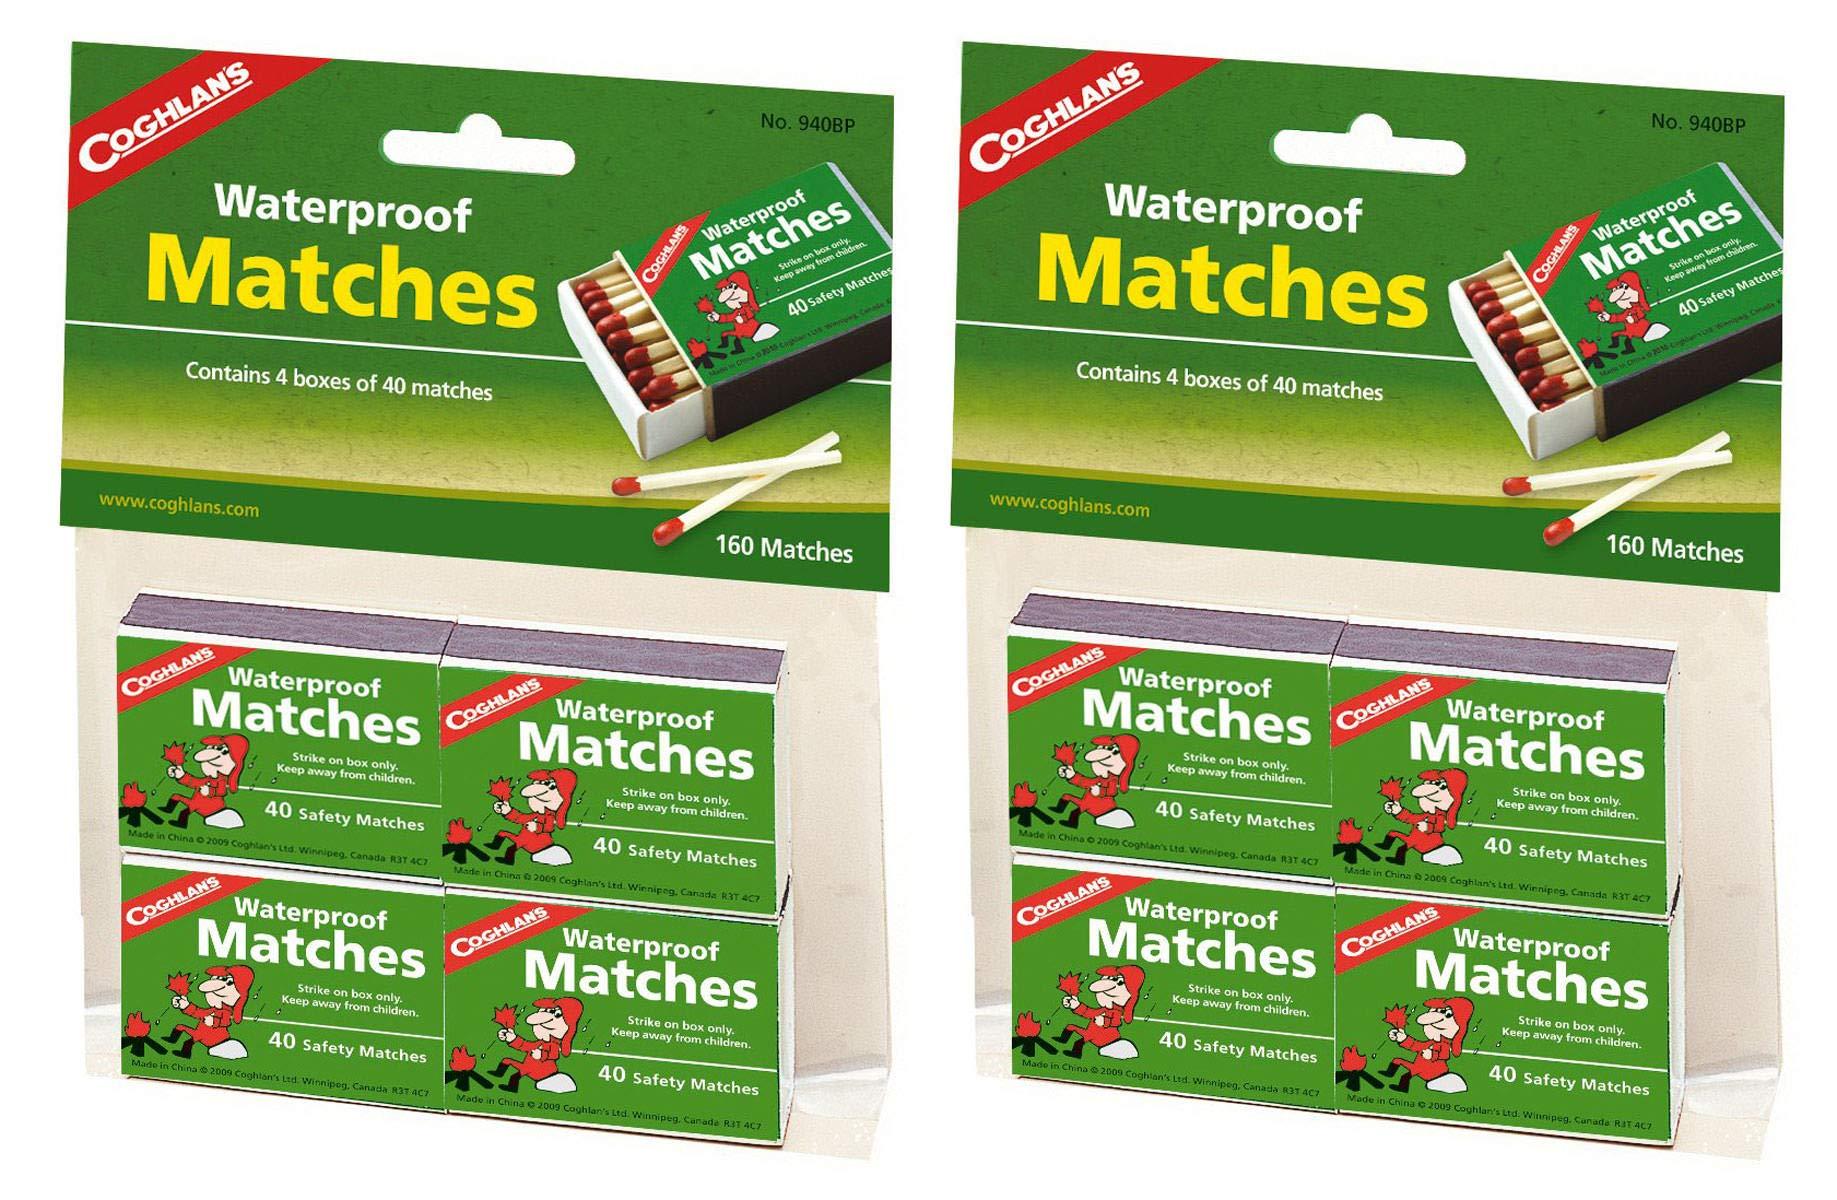 Coghlan's SEQDGUHV 940BP Waterproof Matches, 2 Pack of 8 Boxwe